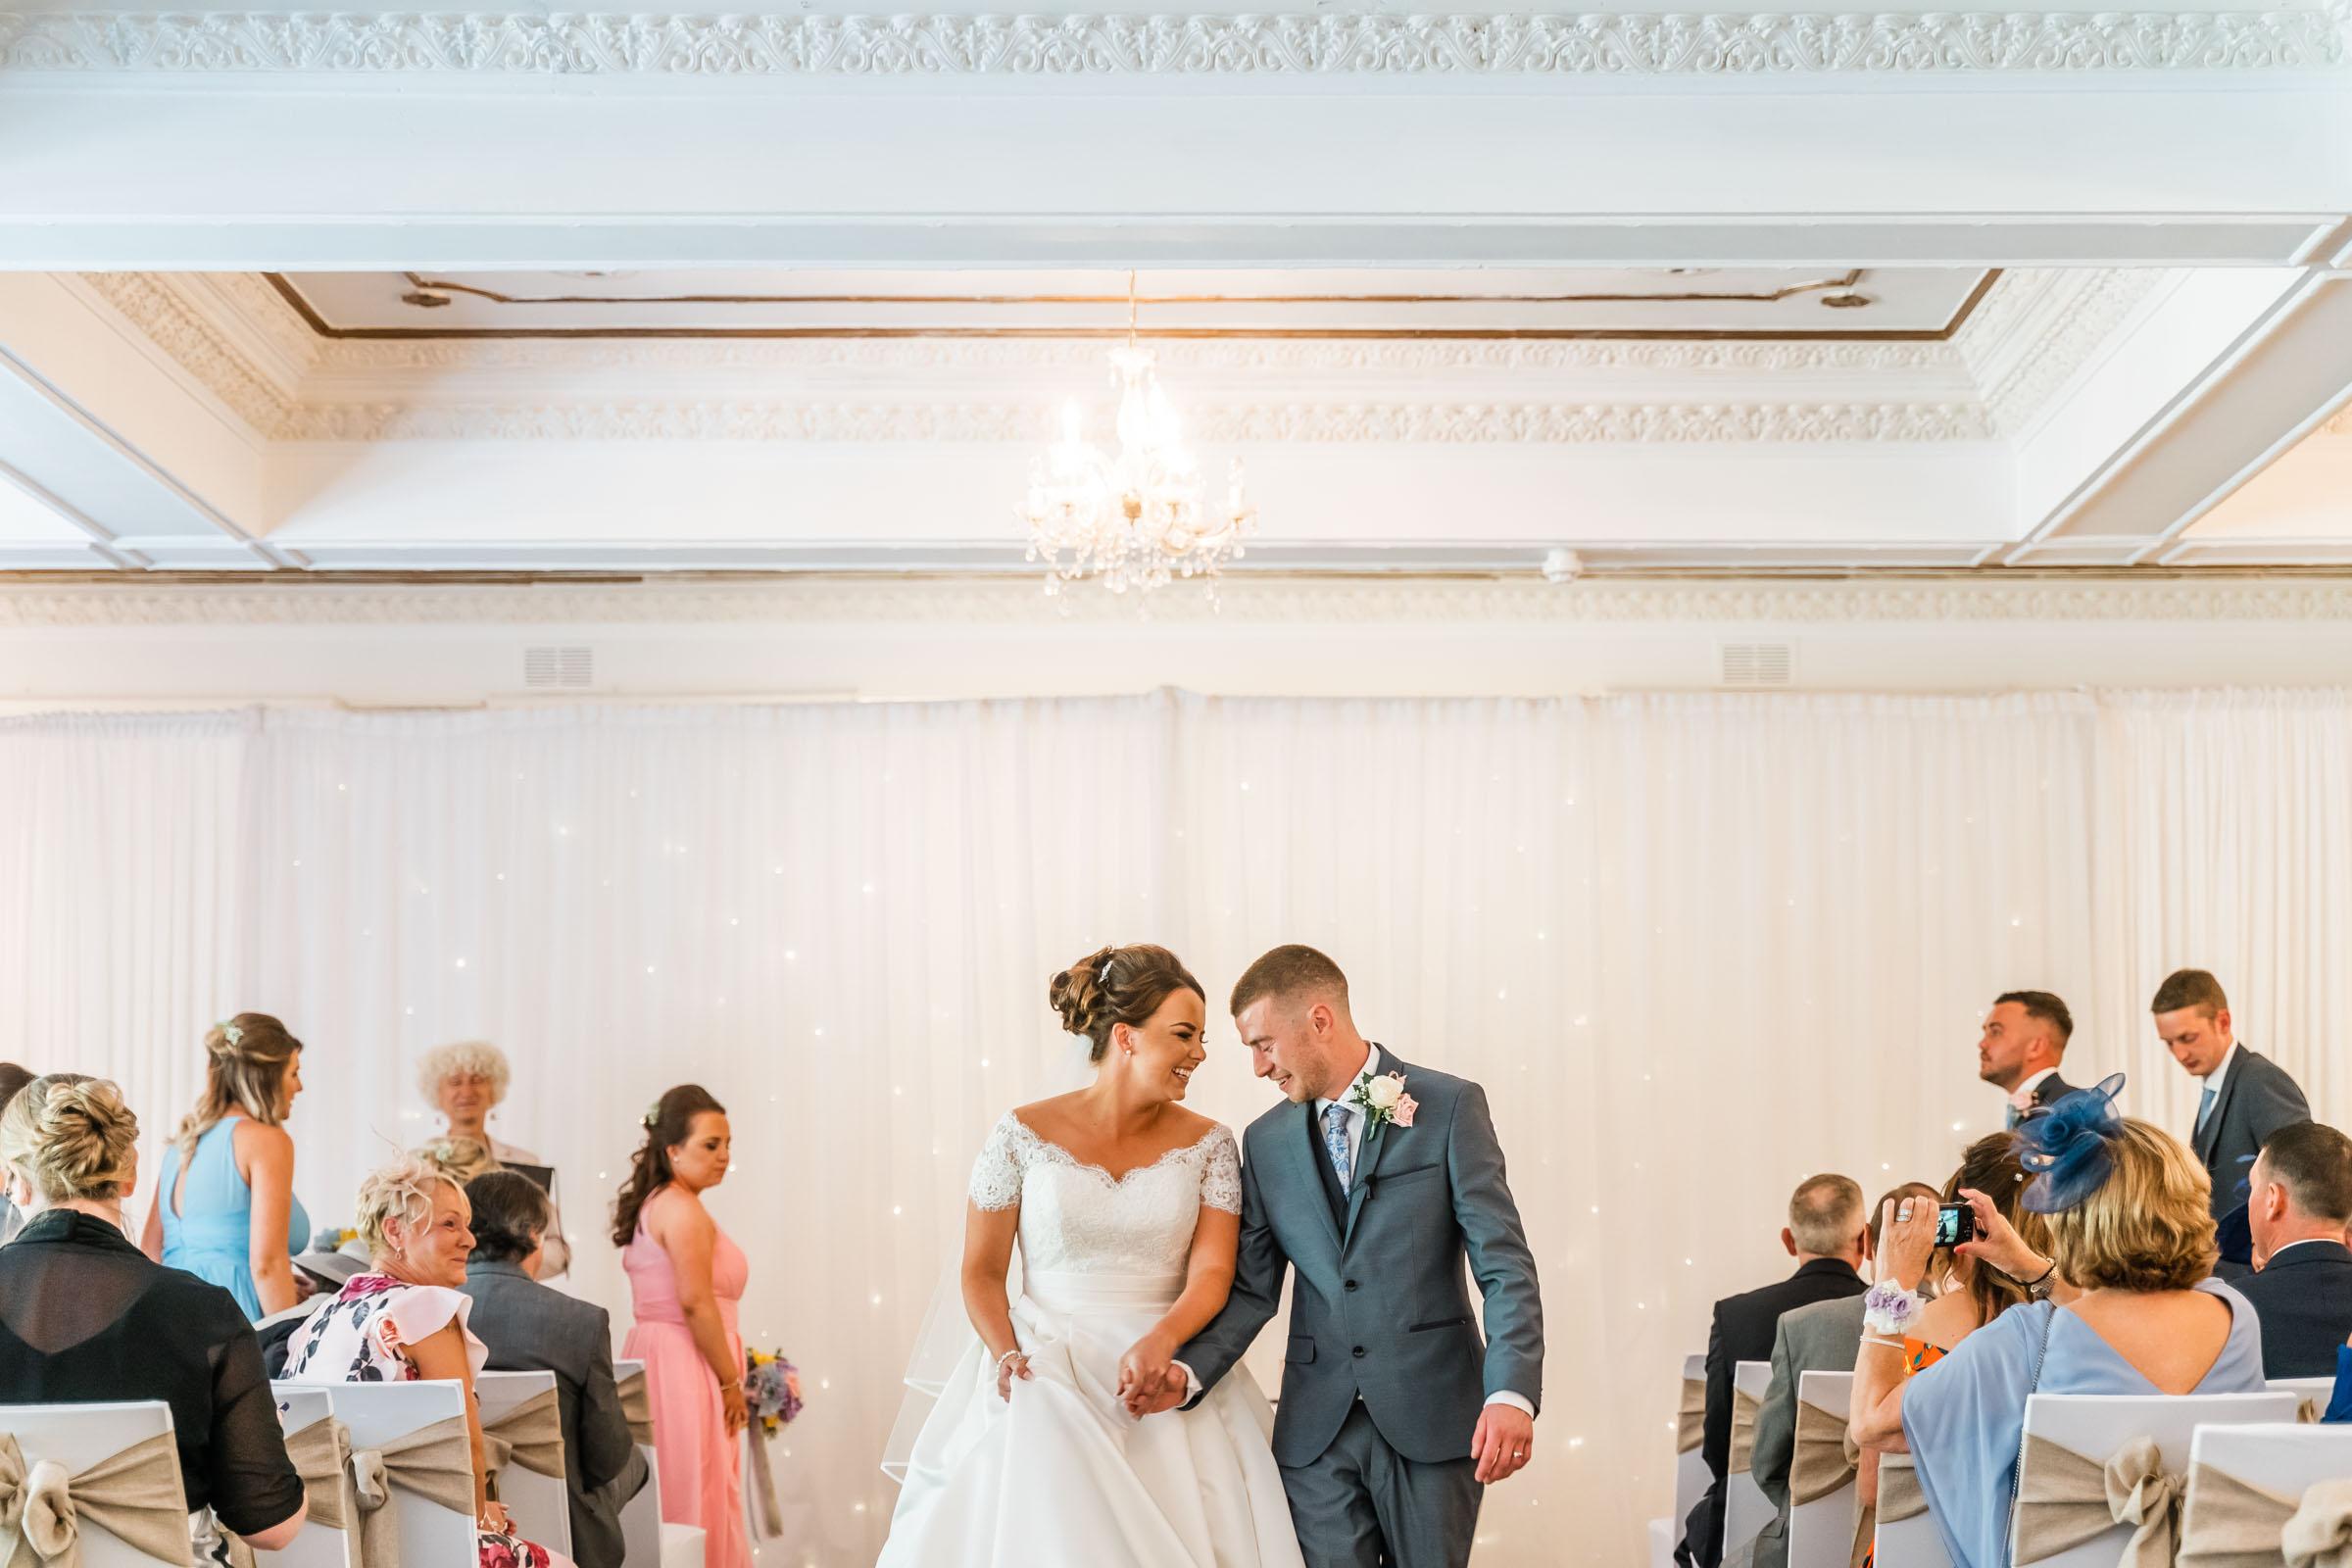 Dalmeny-Park-Glasgow-Wedding-Dearly-Photography-Scotland (27 of 75).jpg